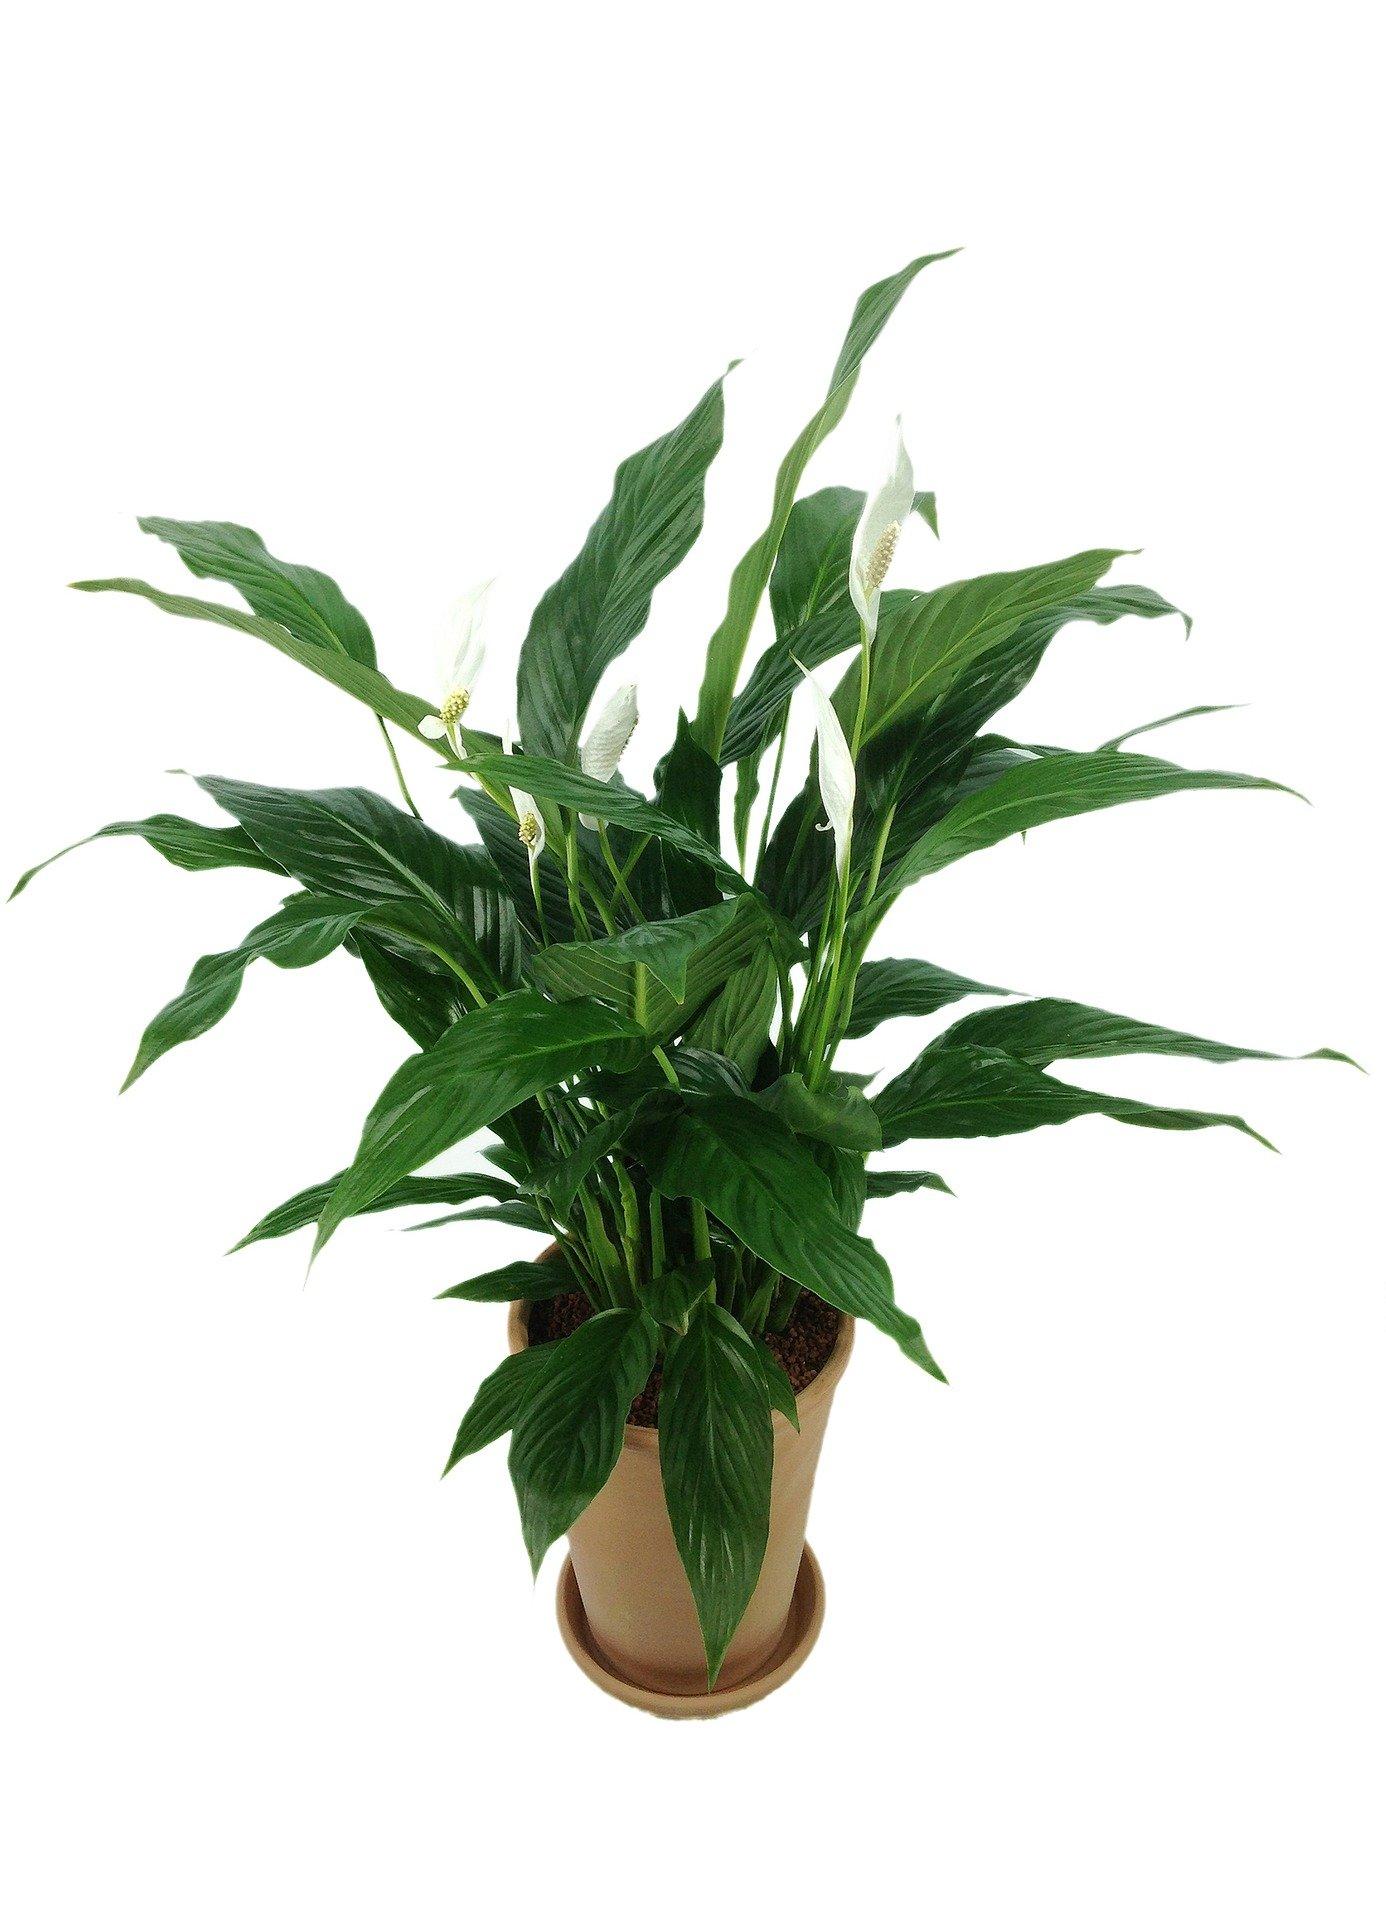 Vitorlavir g vir gz s nak rejt lye balkonada - Giftige zimmerpflanzen ...